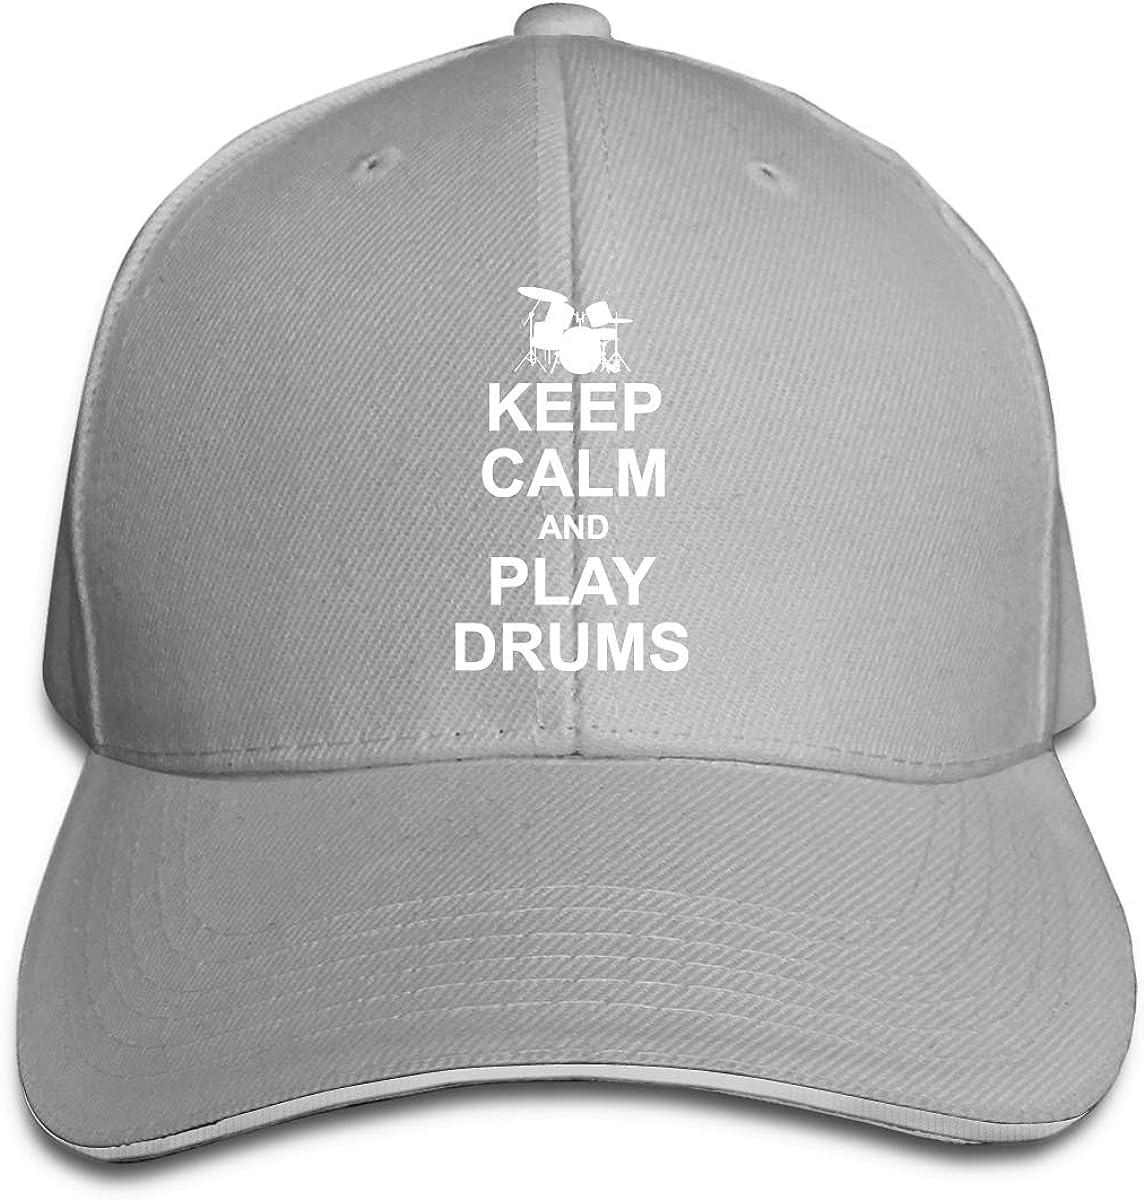 Vintage Style Drumming Drummer Unisex Personalize Denim Casquette Adjustable Baseball Cap